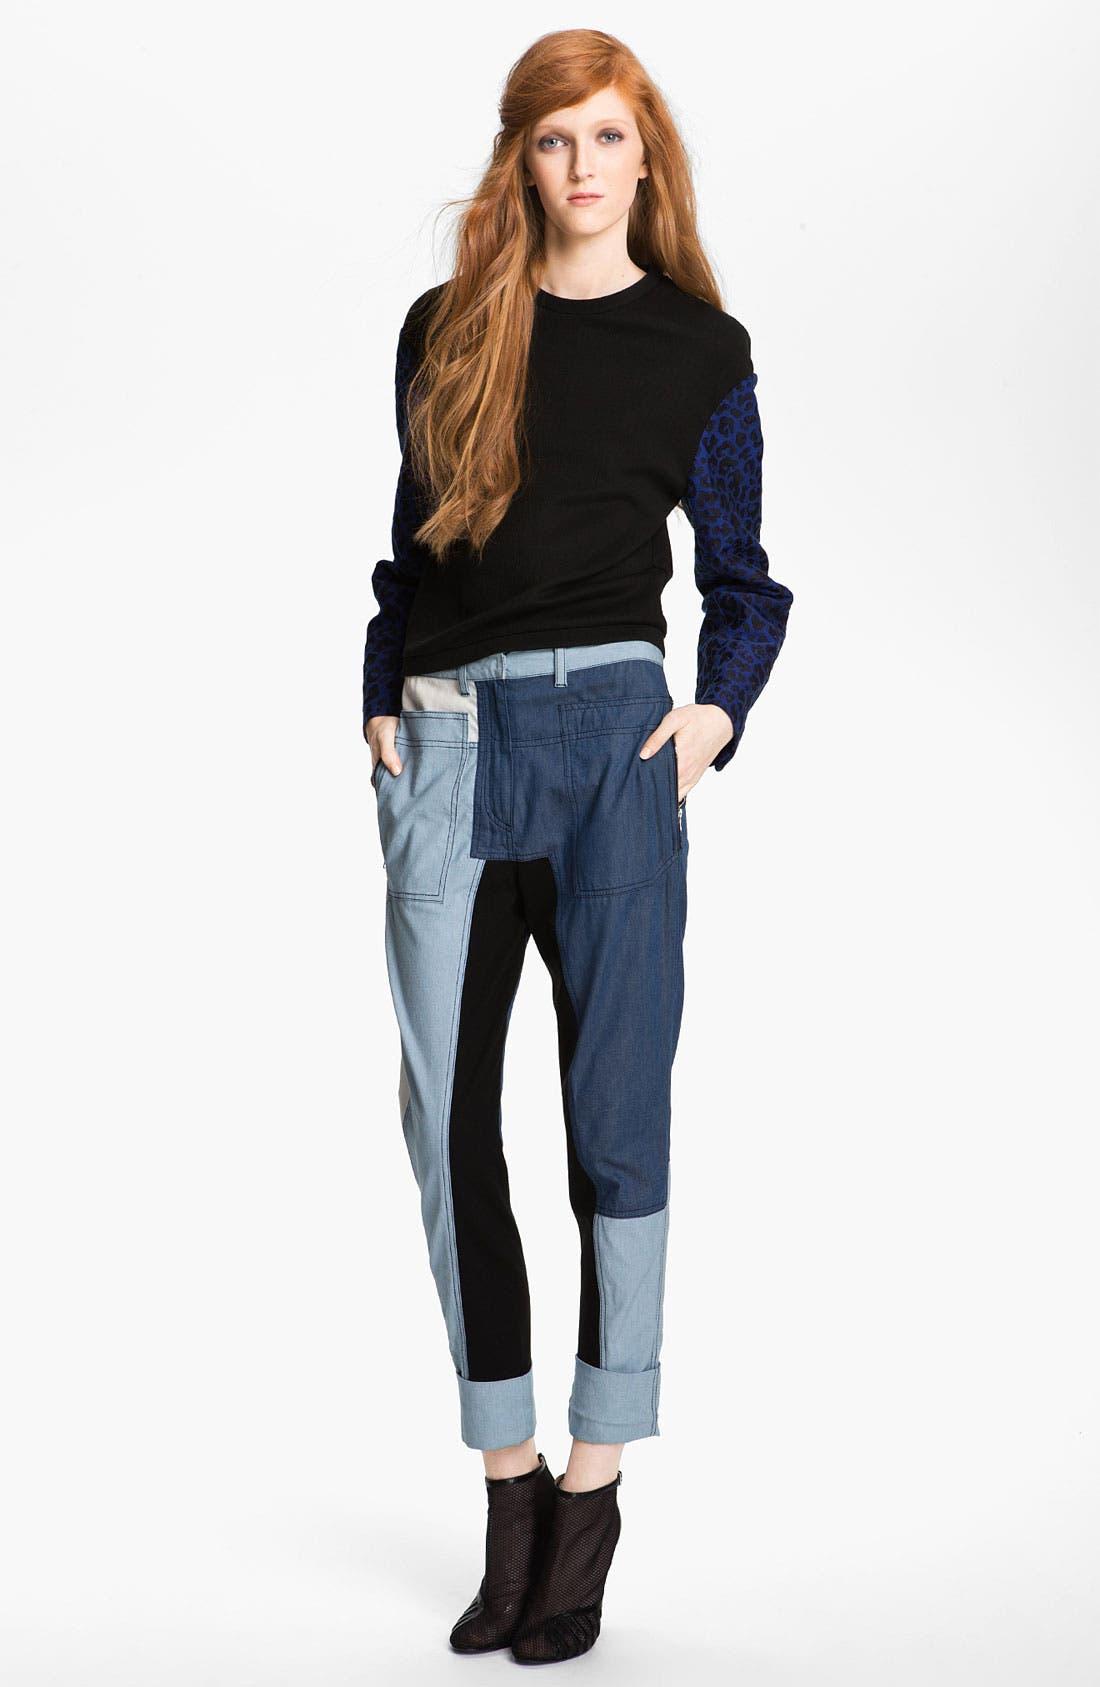 Main Image - 3.1 Phillip Lim Print Sleeve Sweatshirt